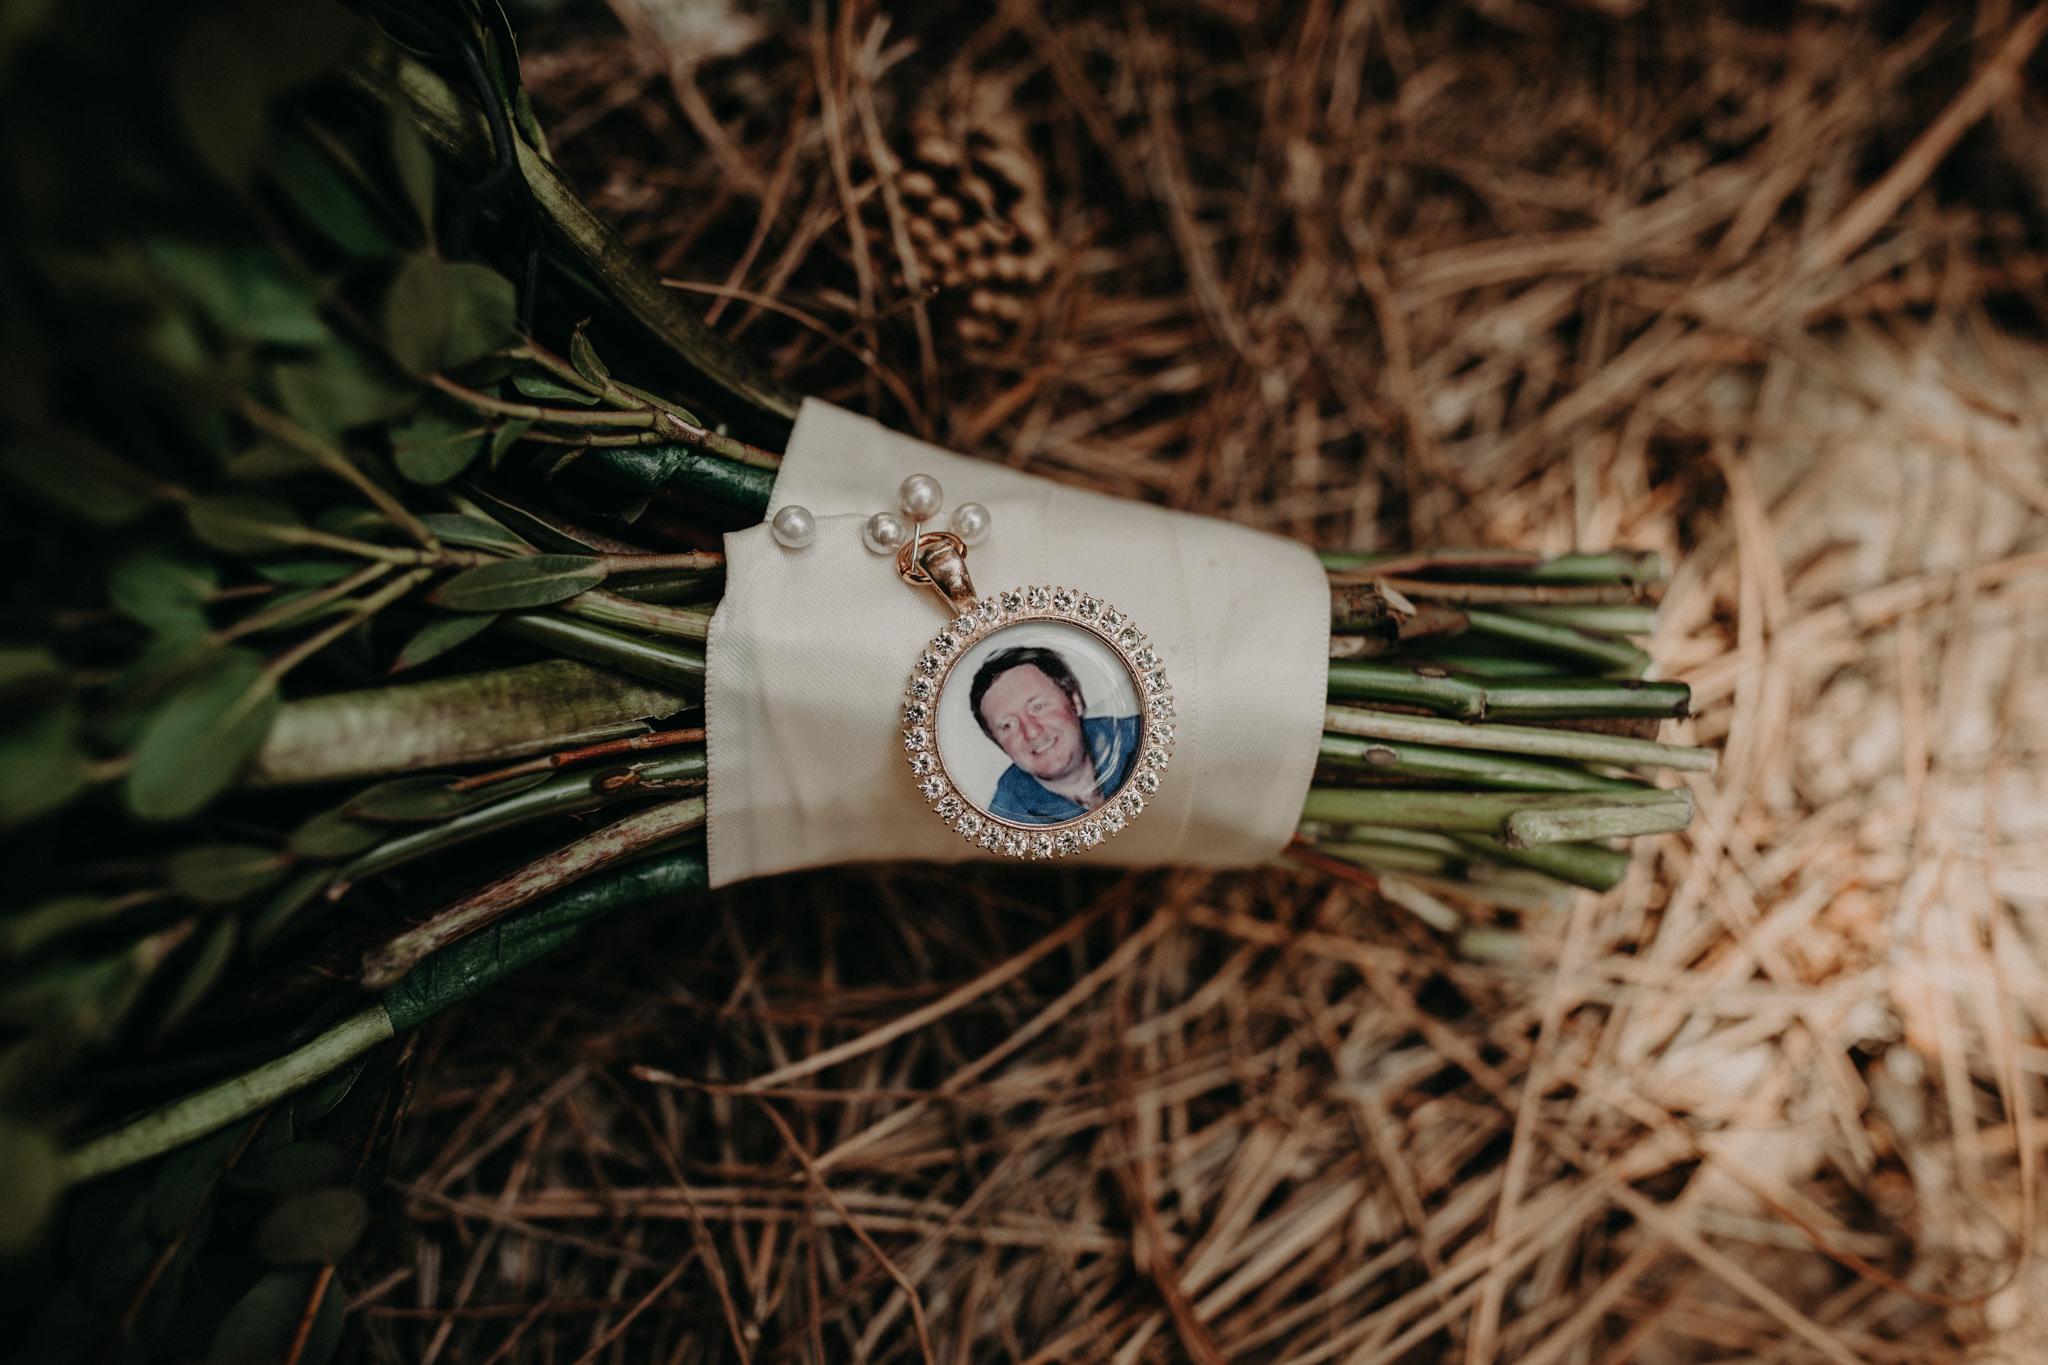 The-Inn-At-St-Johns-Wedding-25.jpg